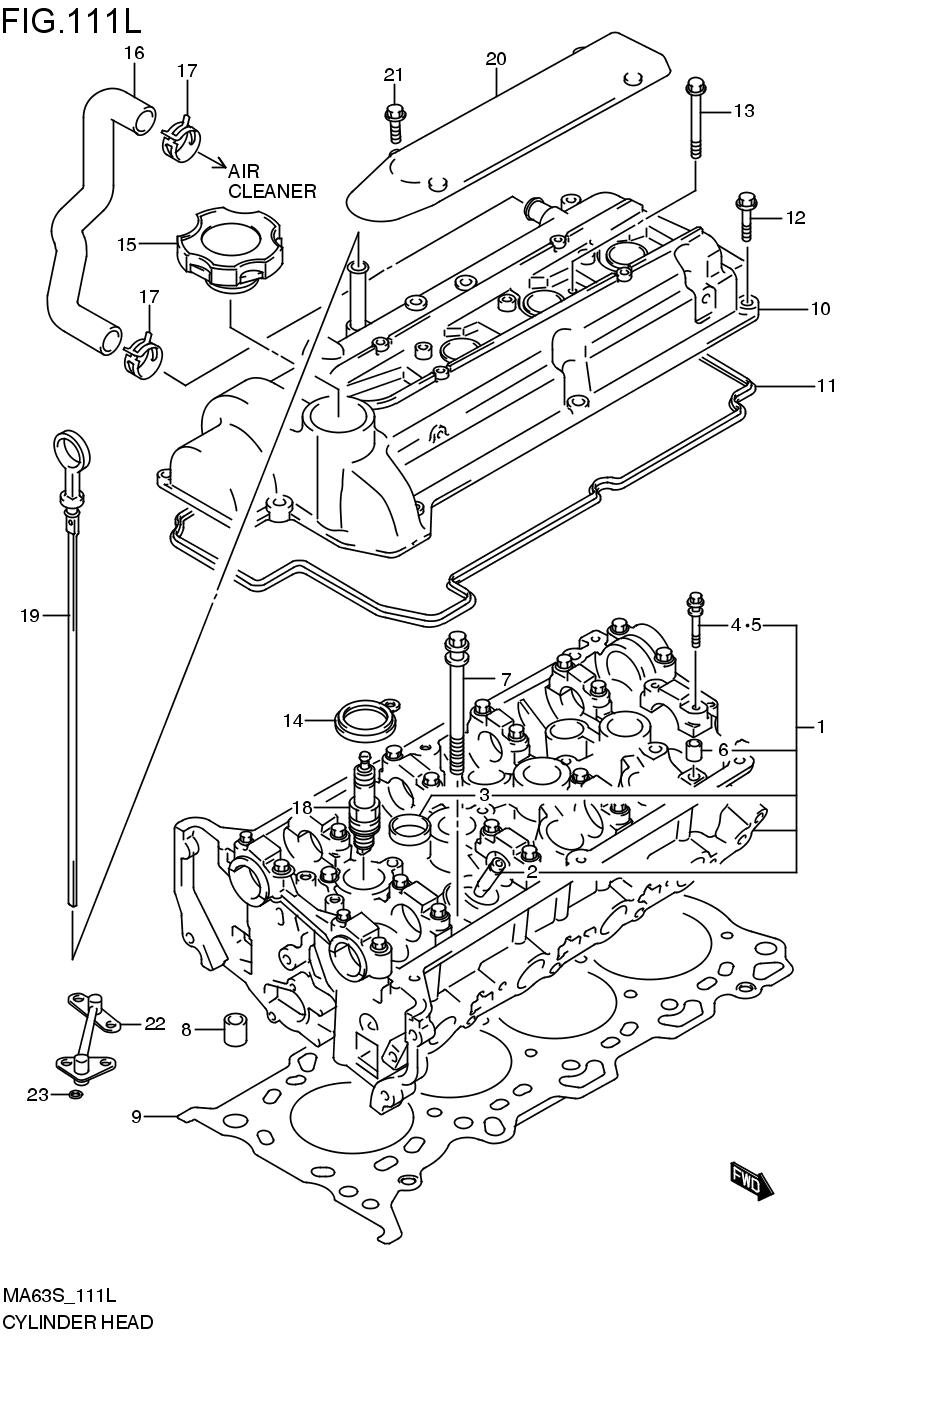 Suzuki Wagon R Wide Ma63s Ma63s 1 Engine Fuel System 111 Car Parts Accessories Be Forward Auto Parts Paper Purse Wagon R Paper Template